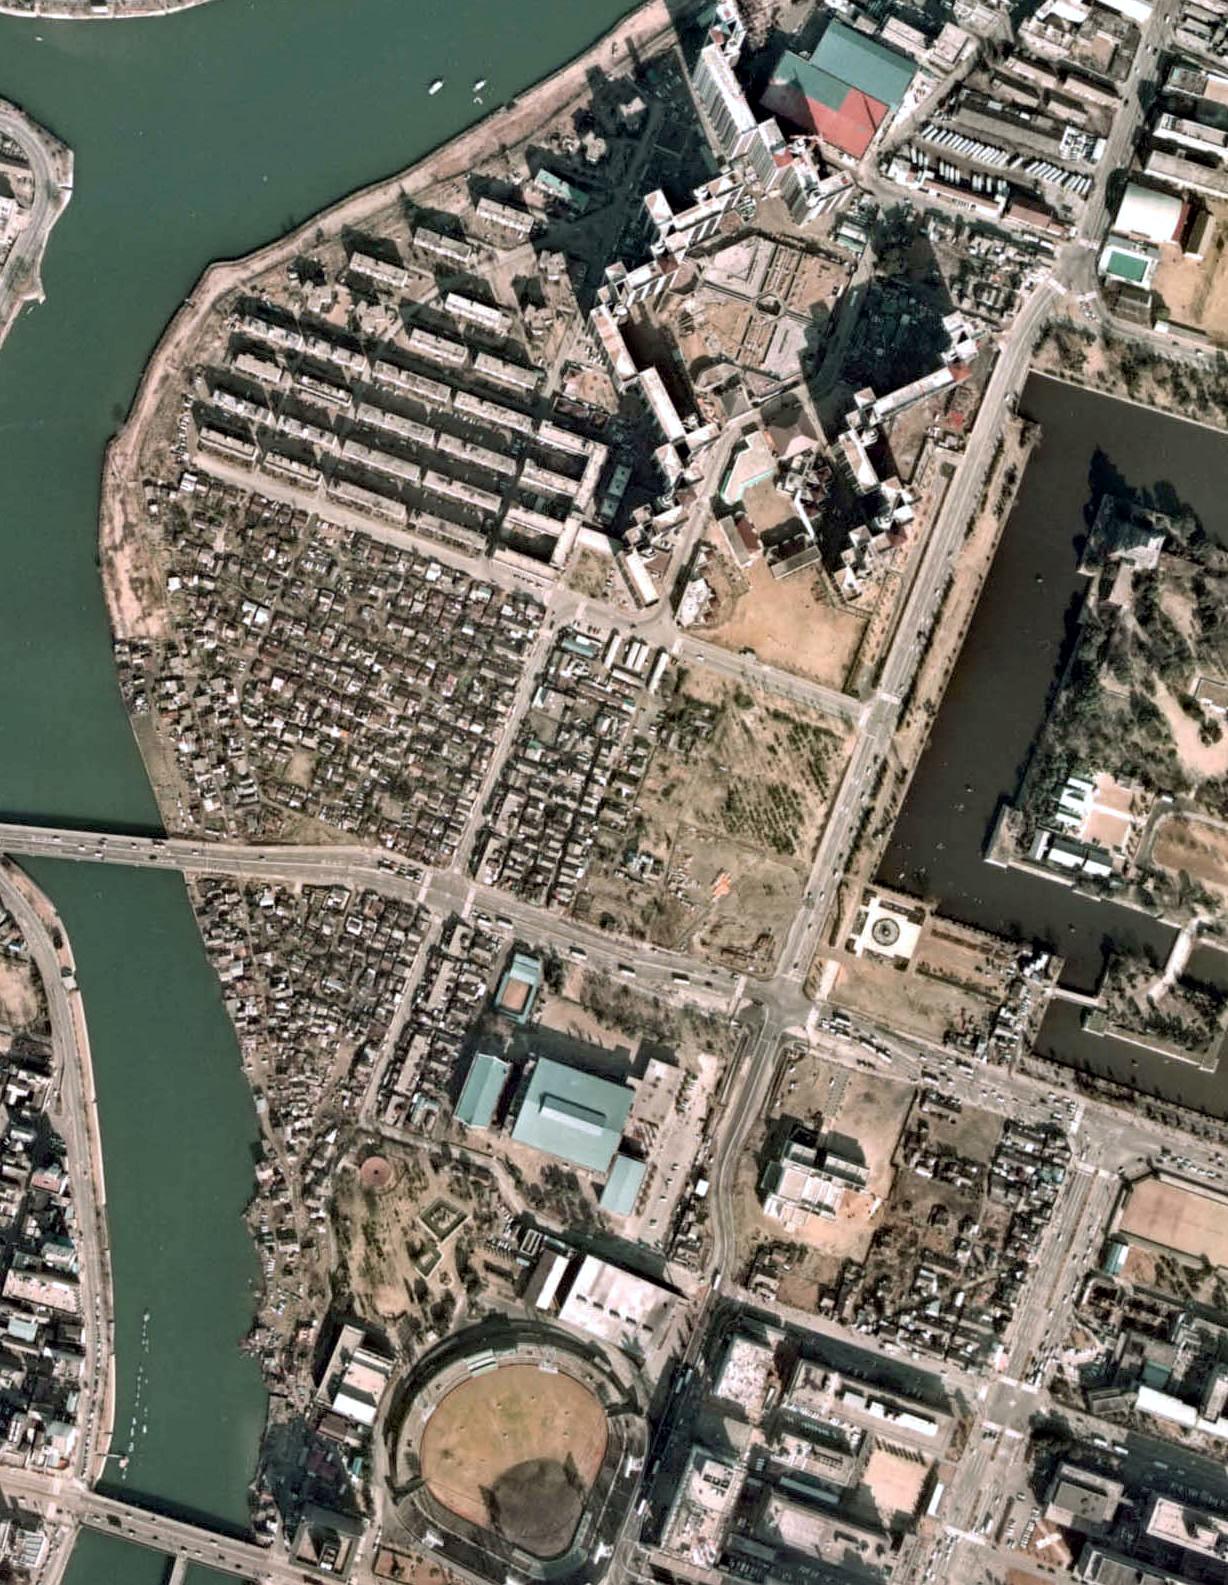 https://upload.wikimedia.org/wikipedia/commons/9/99/Genbaku_Slum_1974.jpg